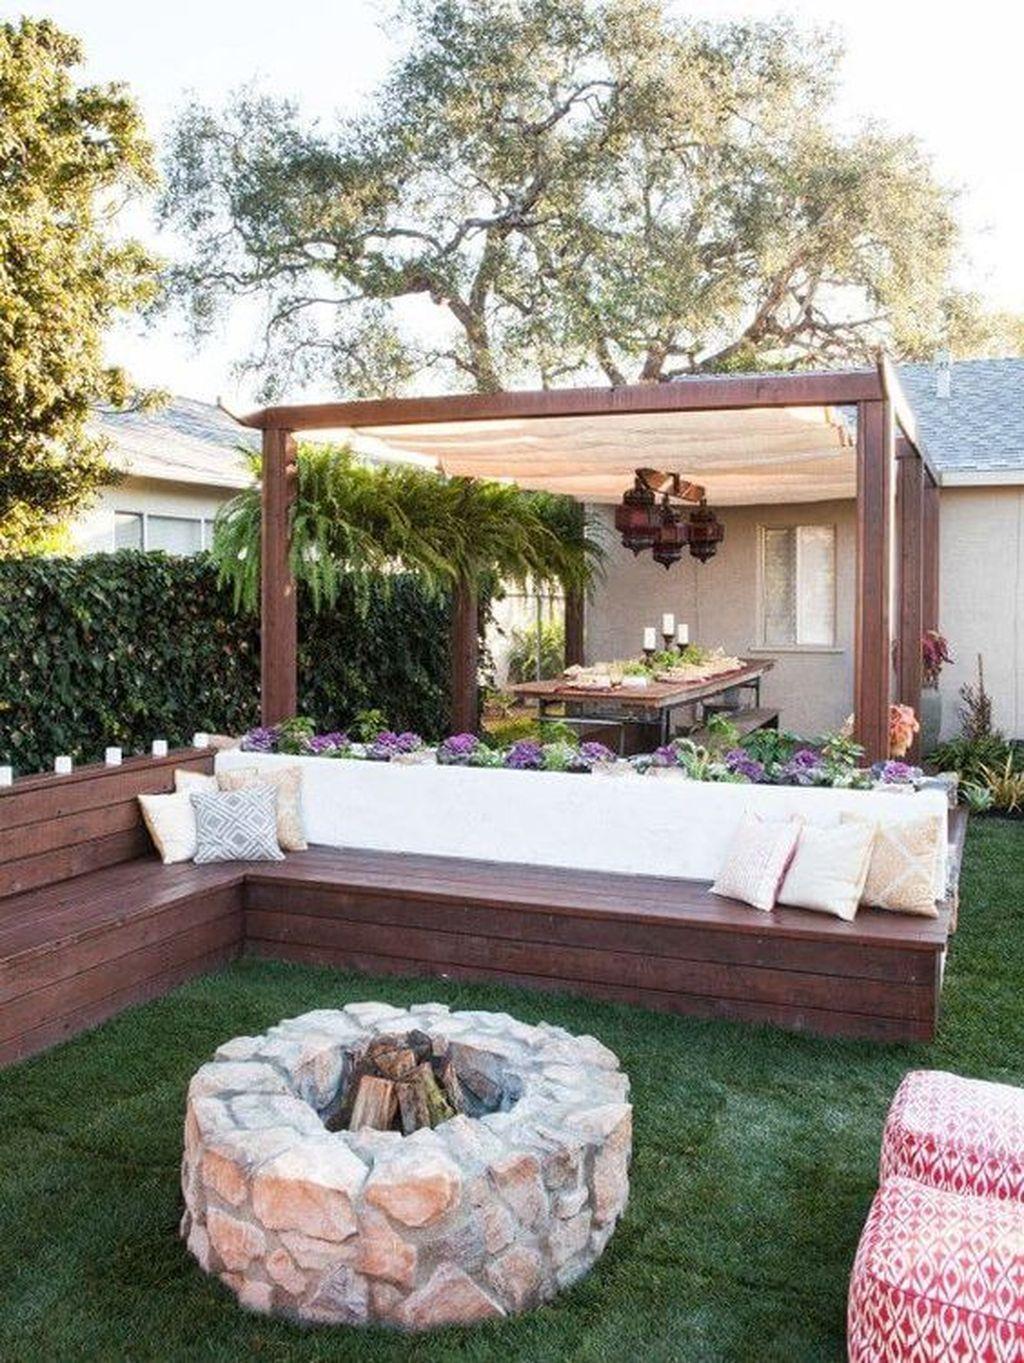 32 Amazing Backyard Seating Ideas Perfect For Summer Backyard